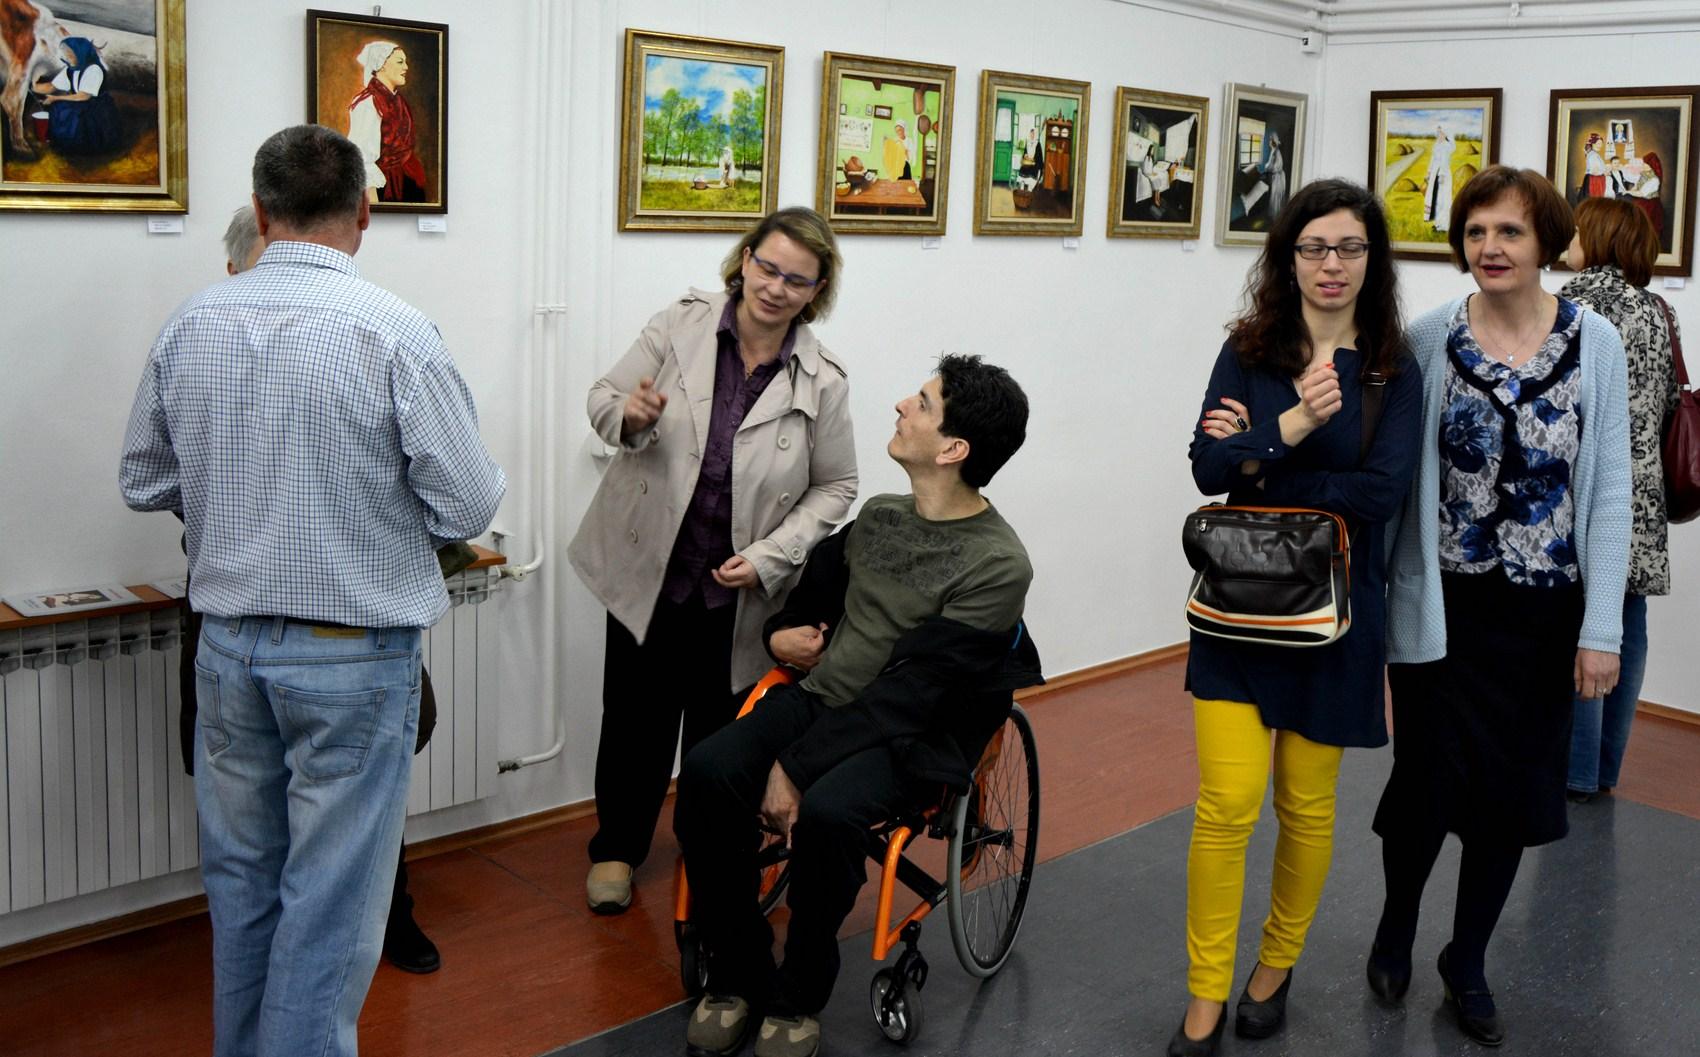 Izložba Anđelko Brkić Galerija Sunce 2017 52